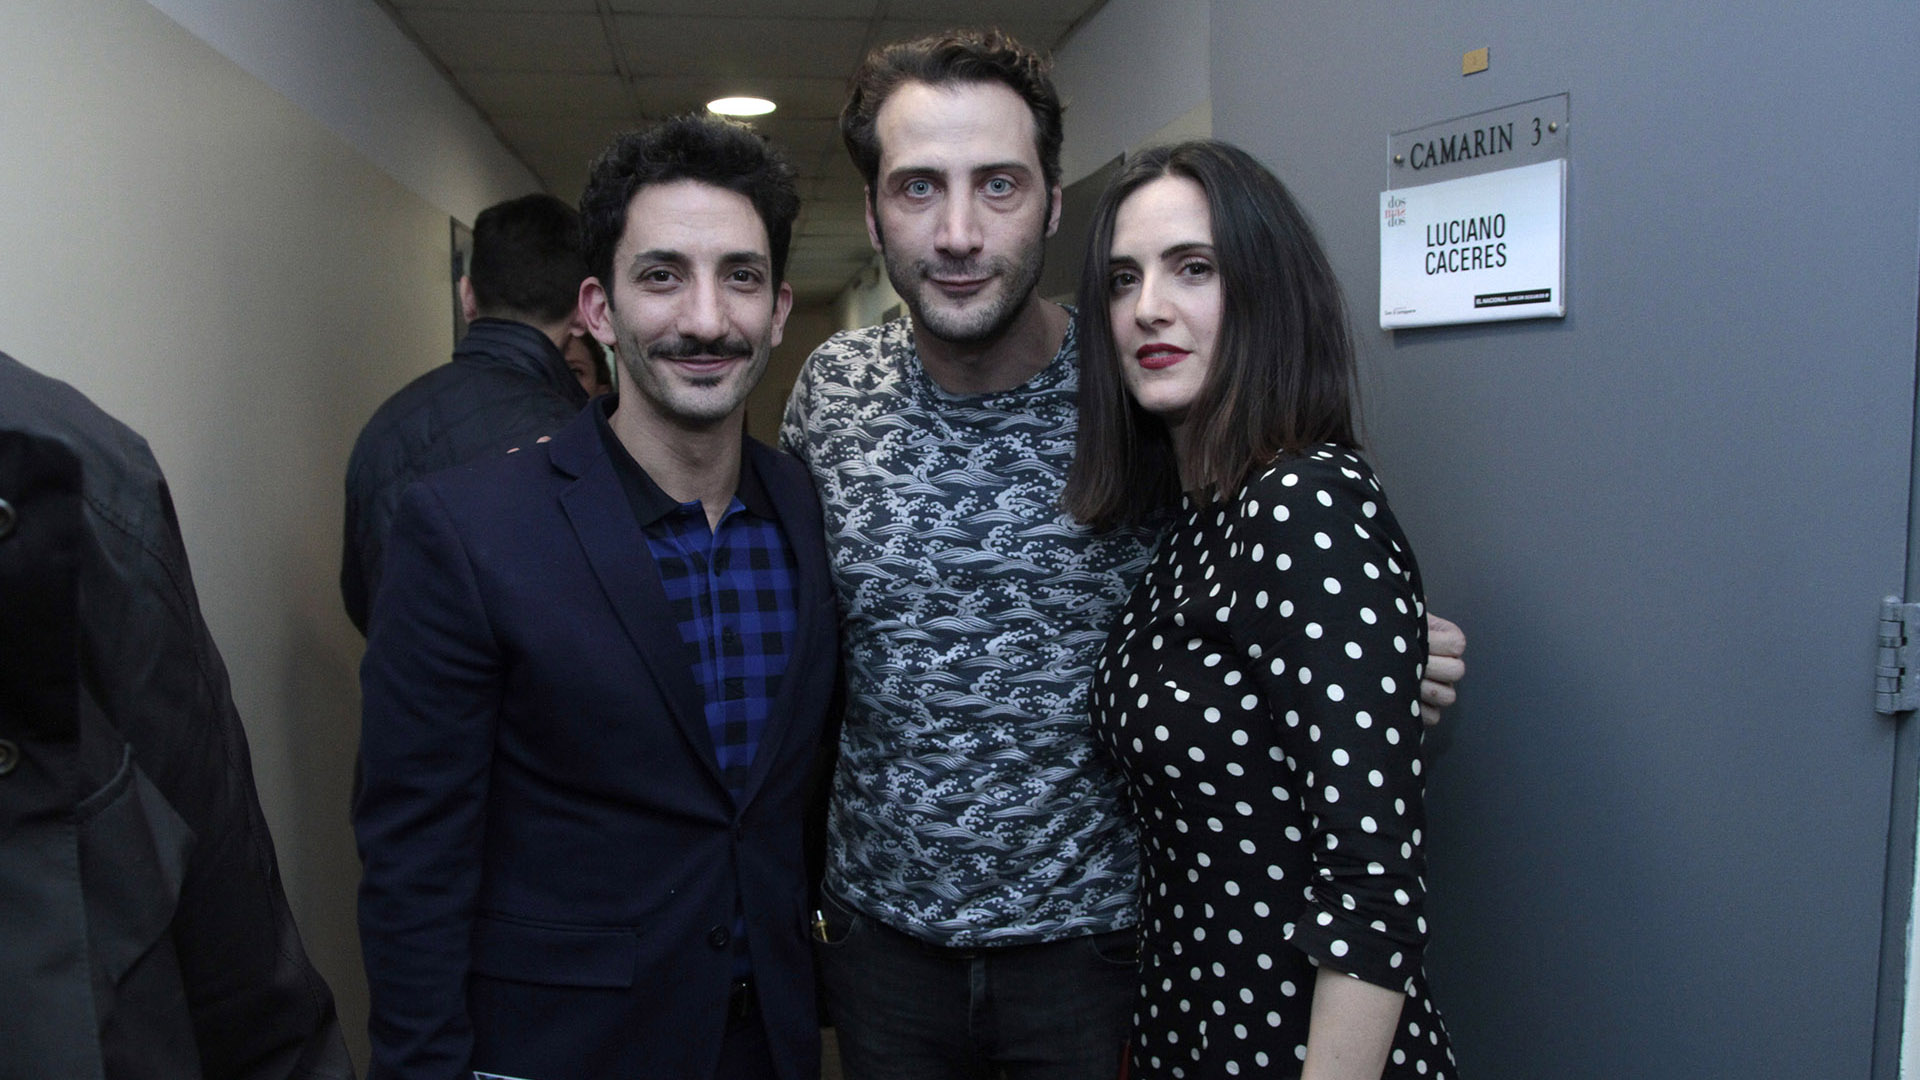 Juan Minujín, Luciano Cáceres y Julieta Díaz (C.Oppizzi)